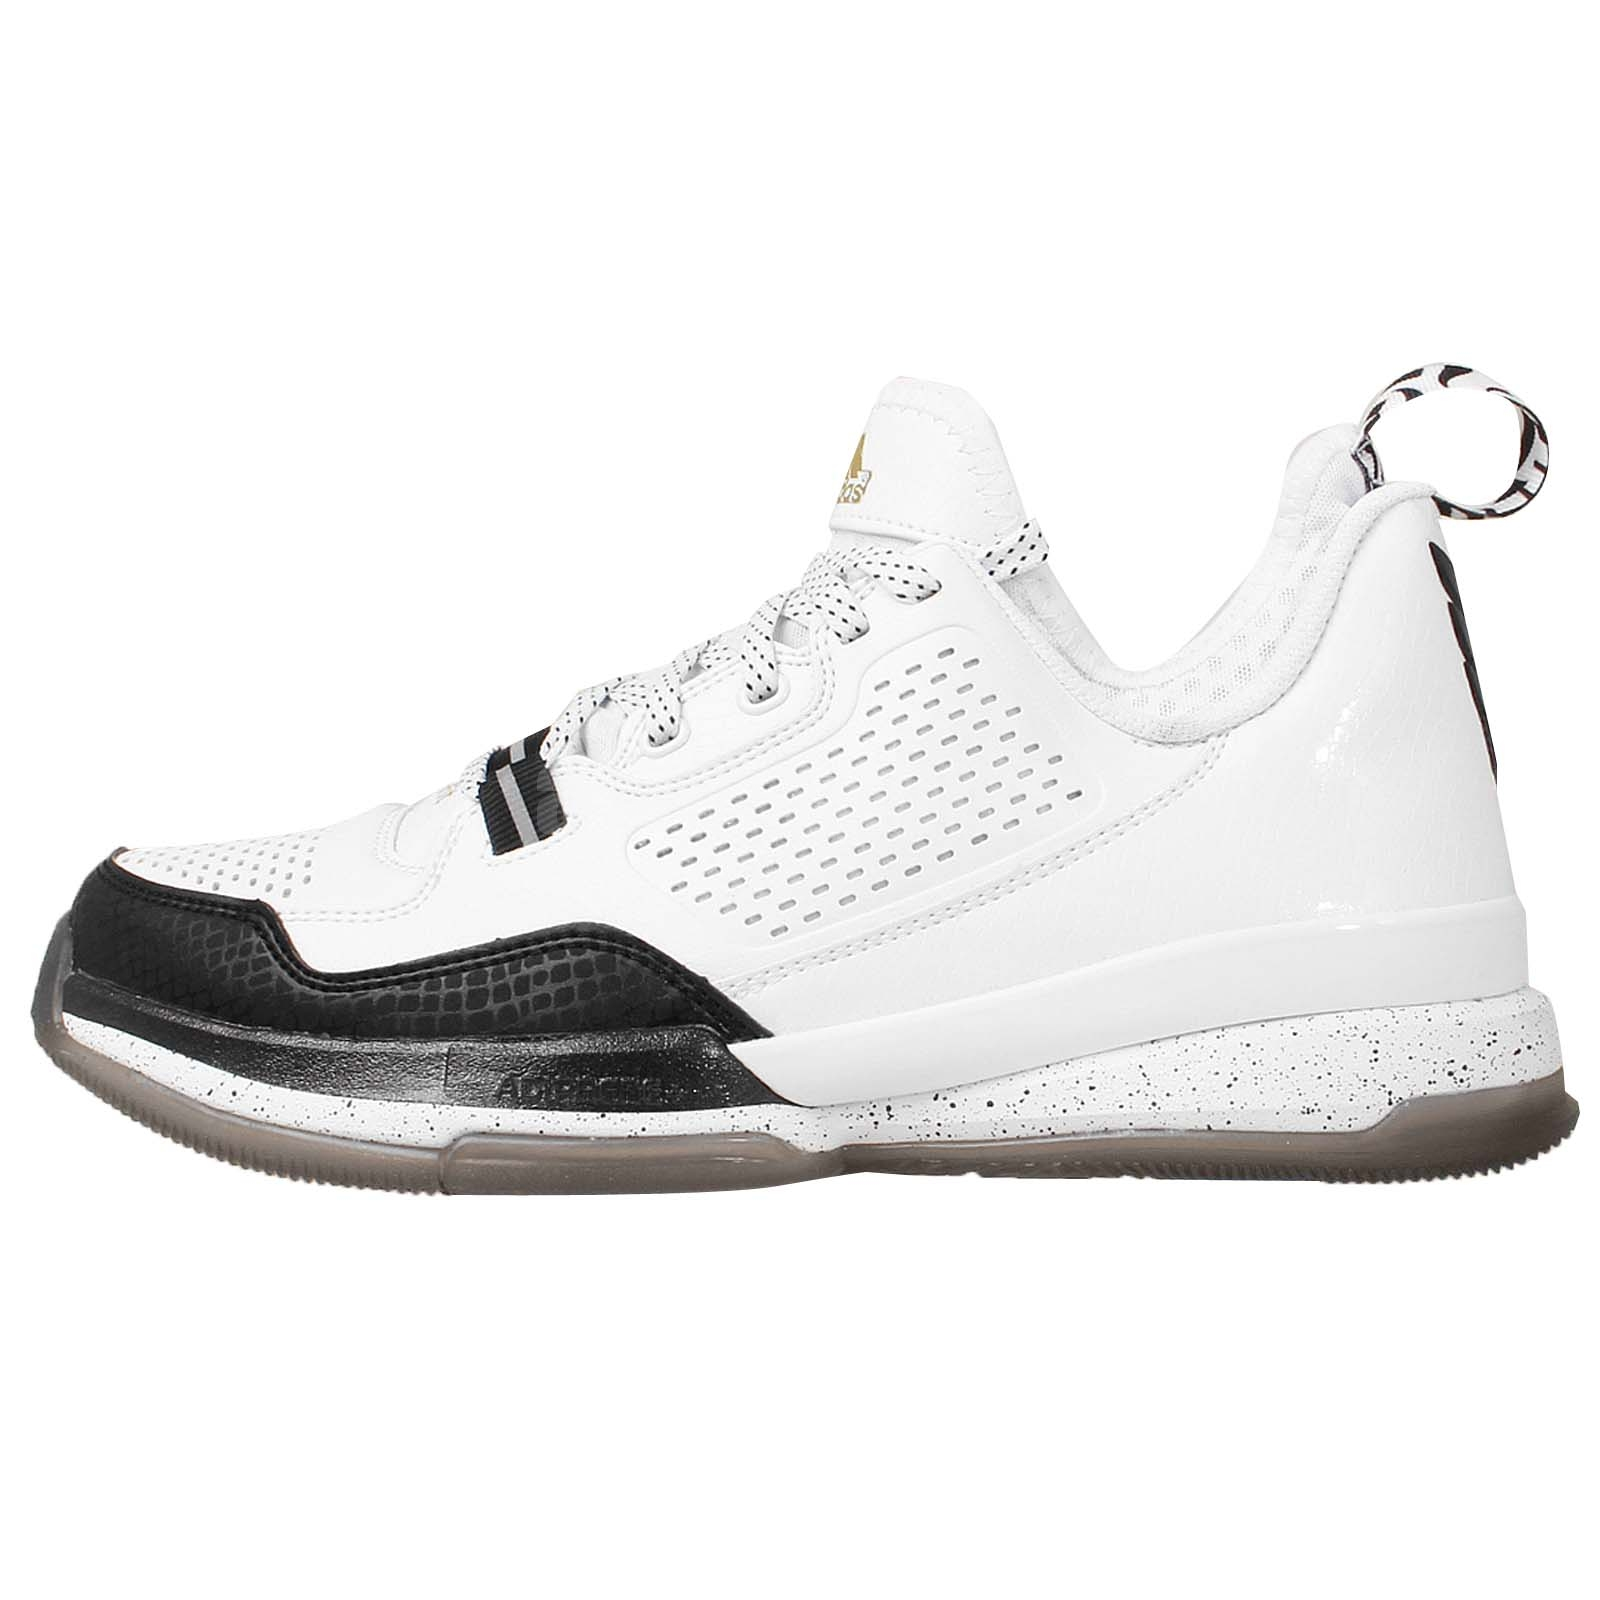 Damian Lillard All White Shoes